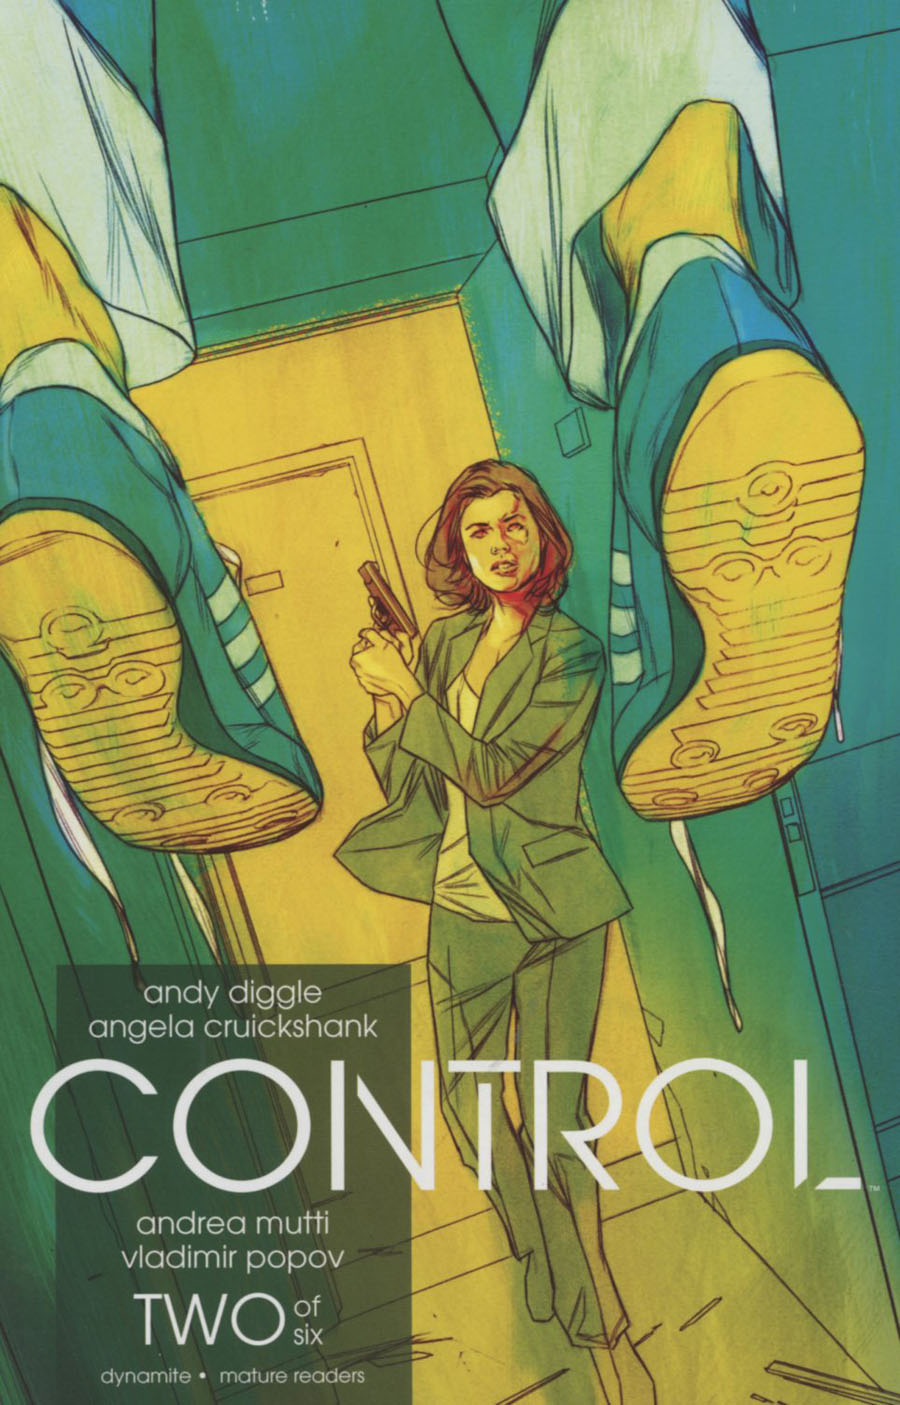 Control #2